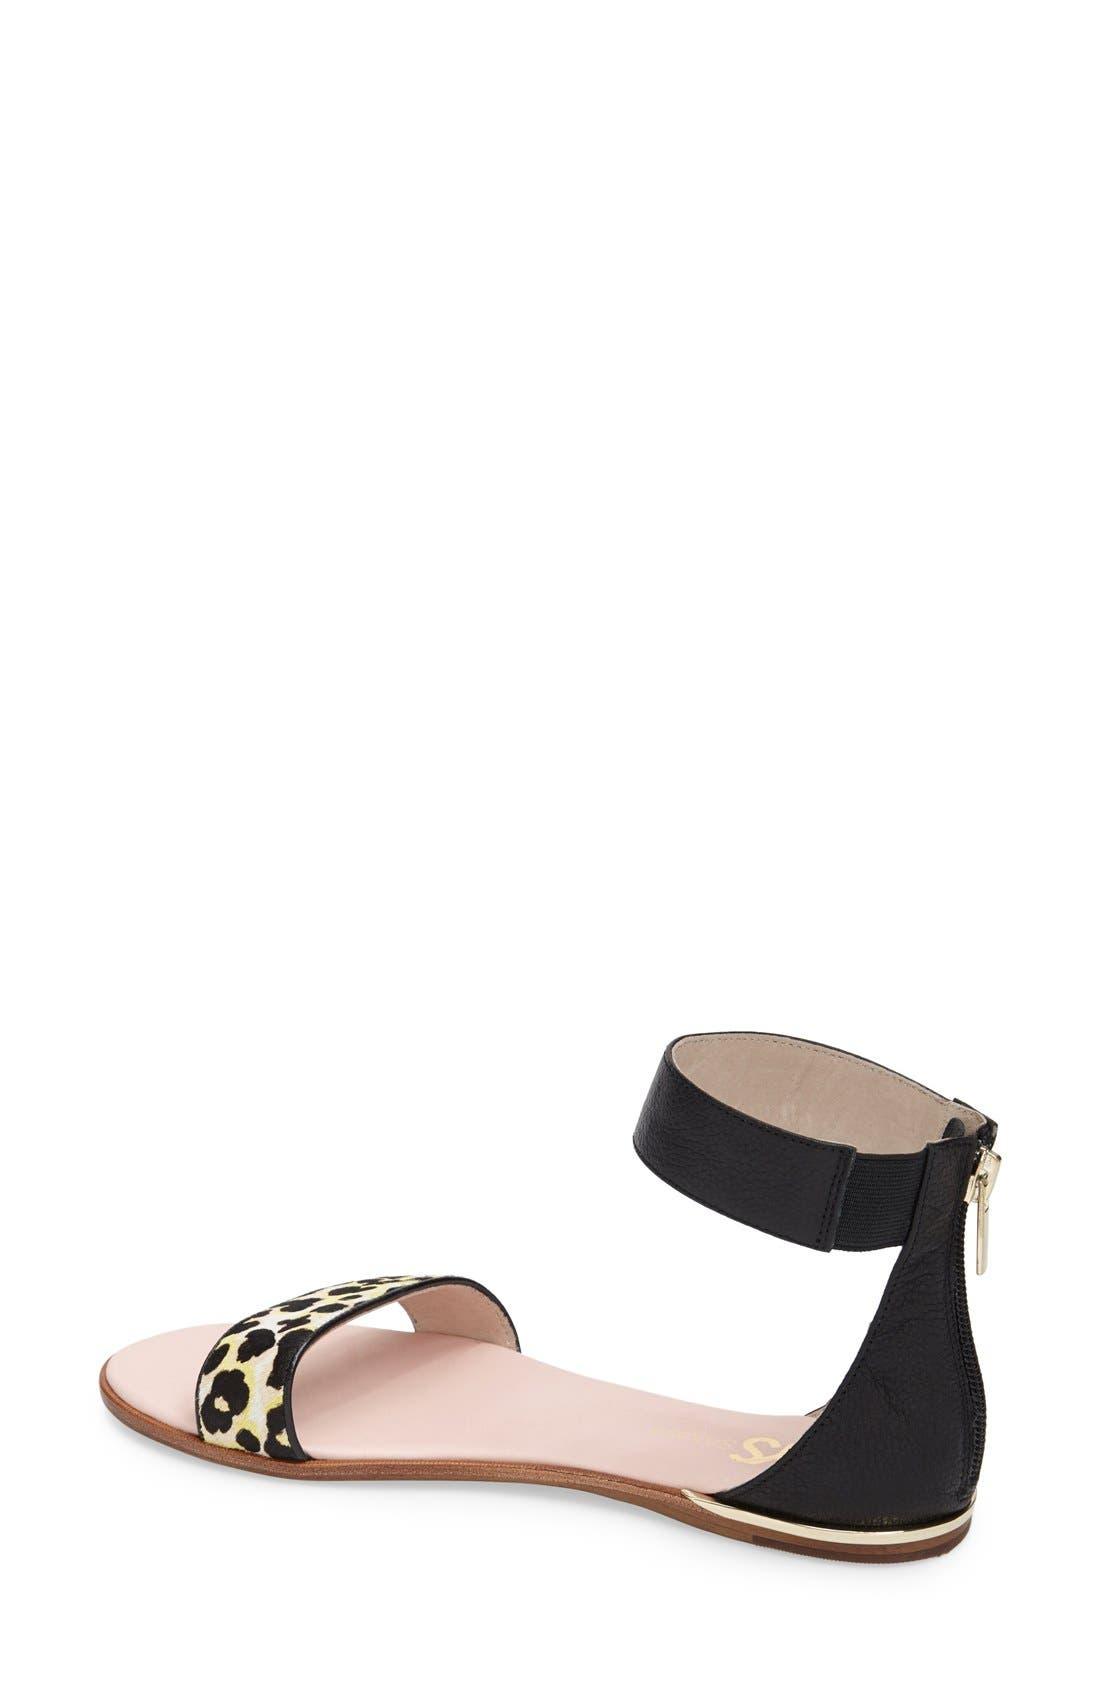 ,                             'Cambelle' Ankle Strap Sandal,                             Alternate thumbnail 41, color,                             275